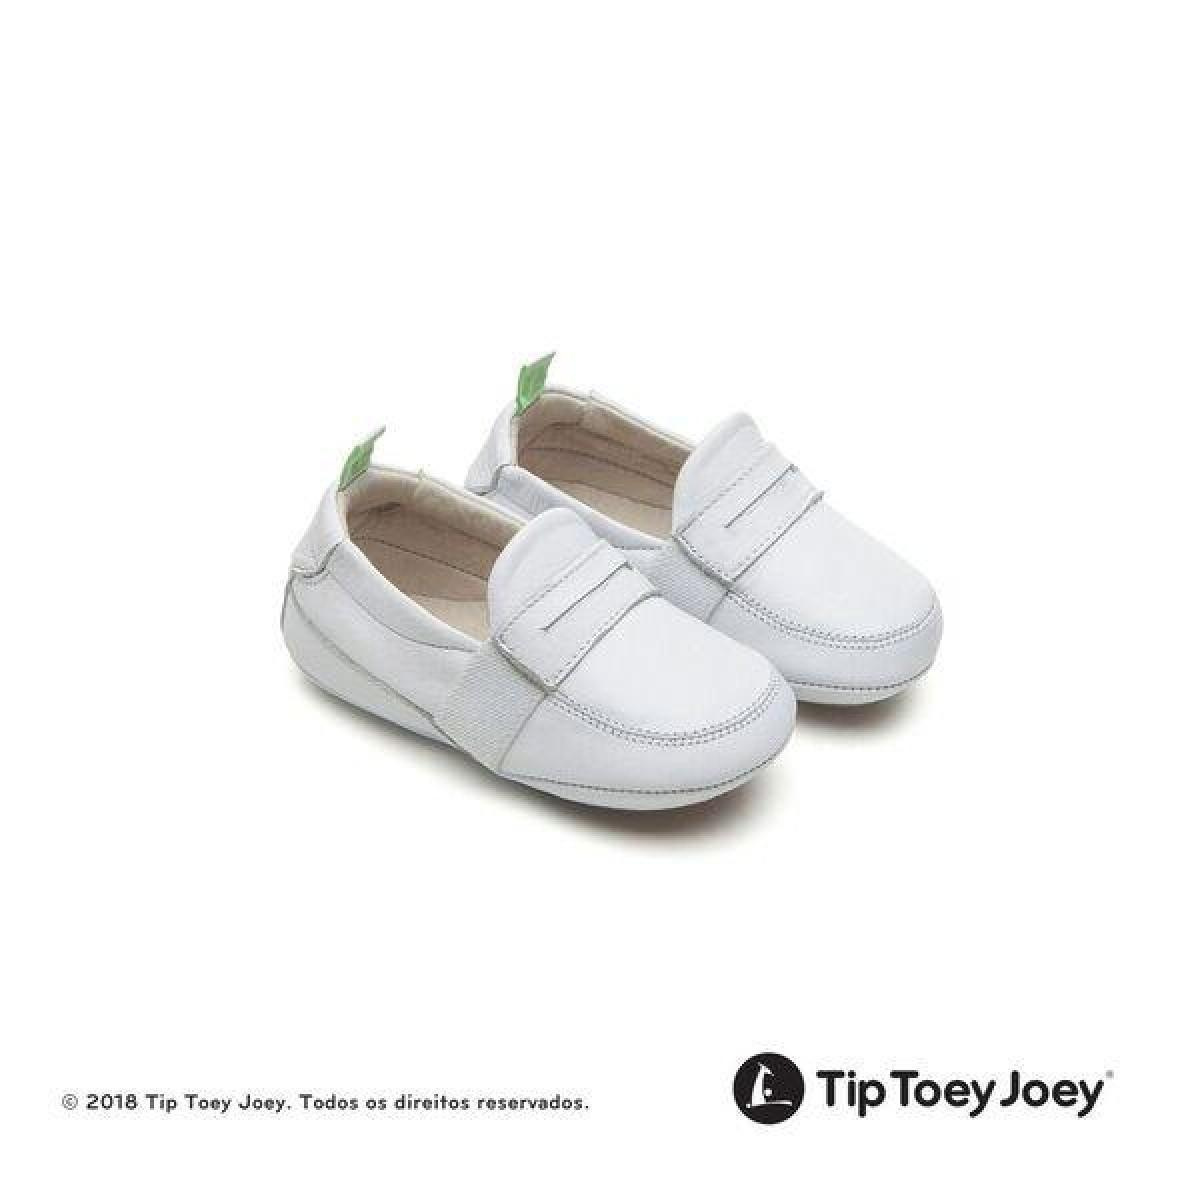 47df1c60c0 SAPATO TIP TOEY JOEY SHARPY WHITE (BRANCO) - Tutti Frutti Calçados ...